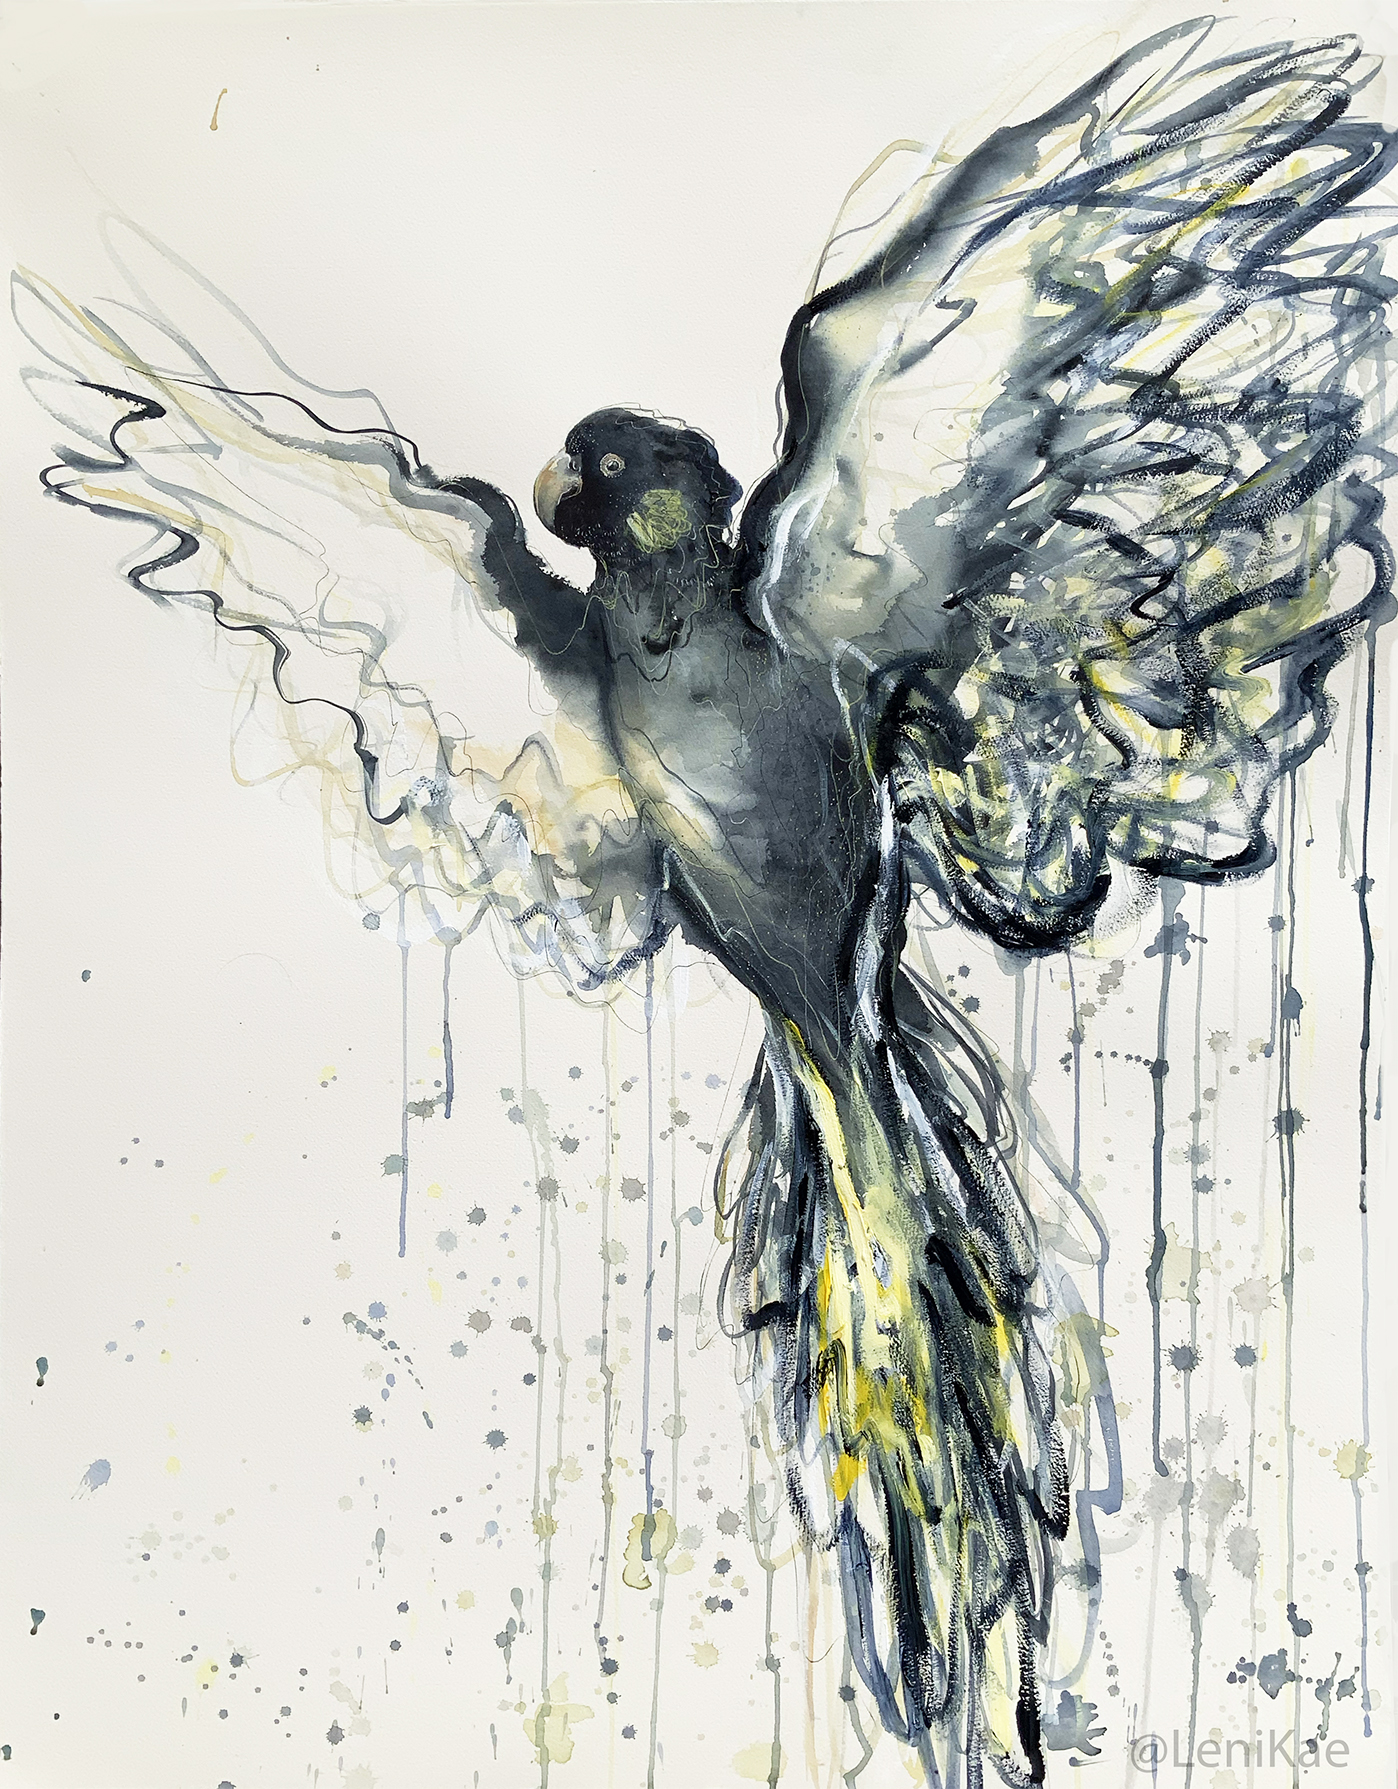 2a. Sydney Artist Leni Kae Flight Of The Yellow Tailed Black Cockatoo Bird Art Painting